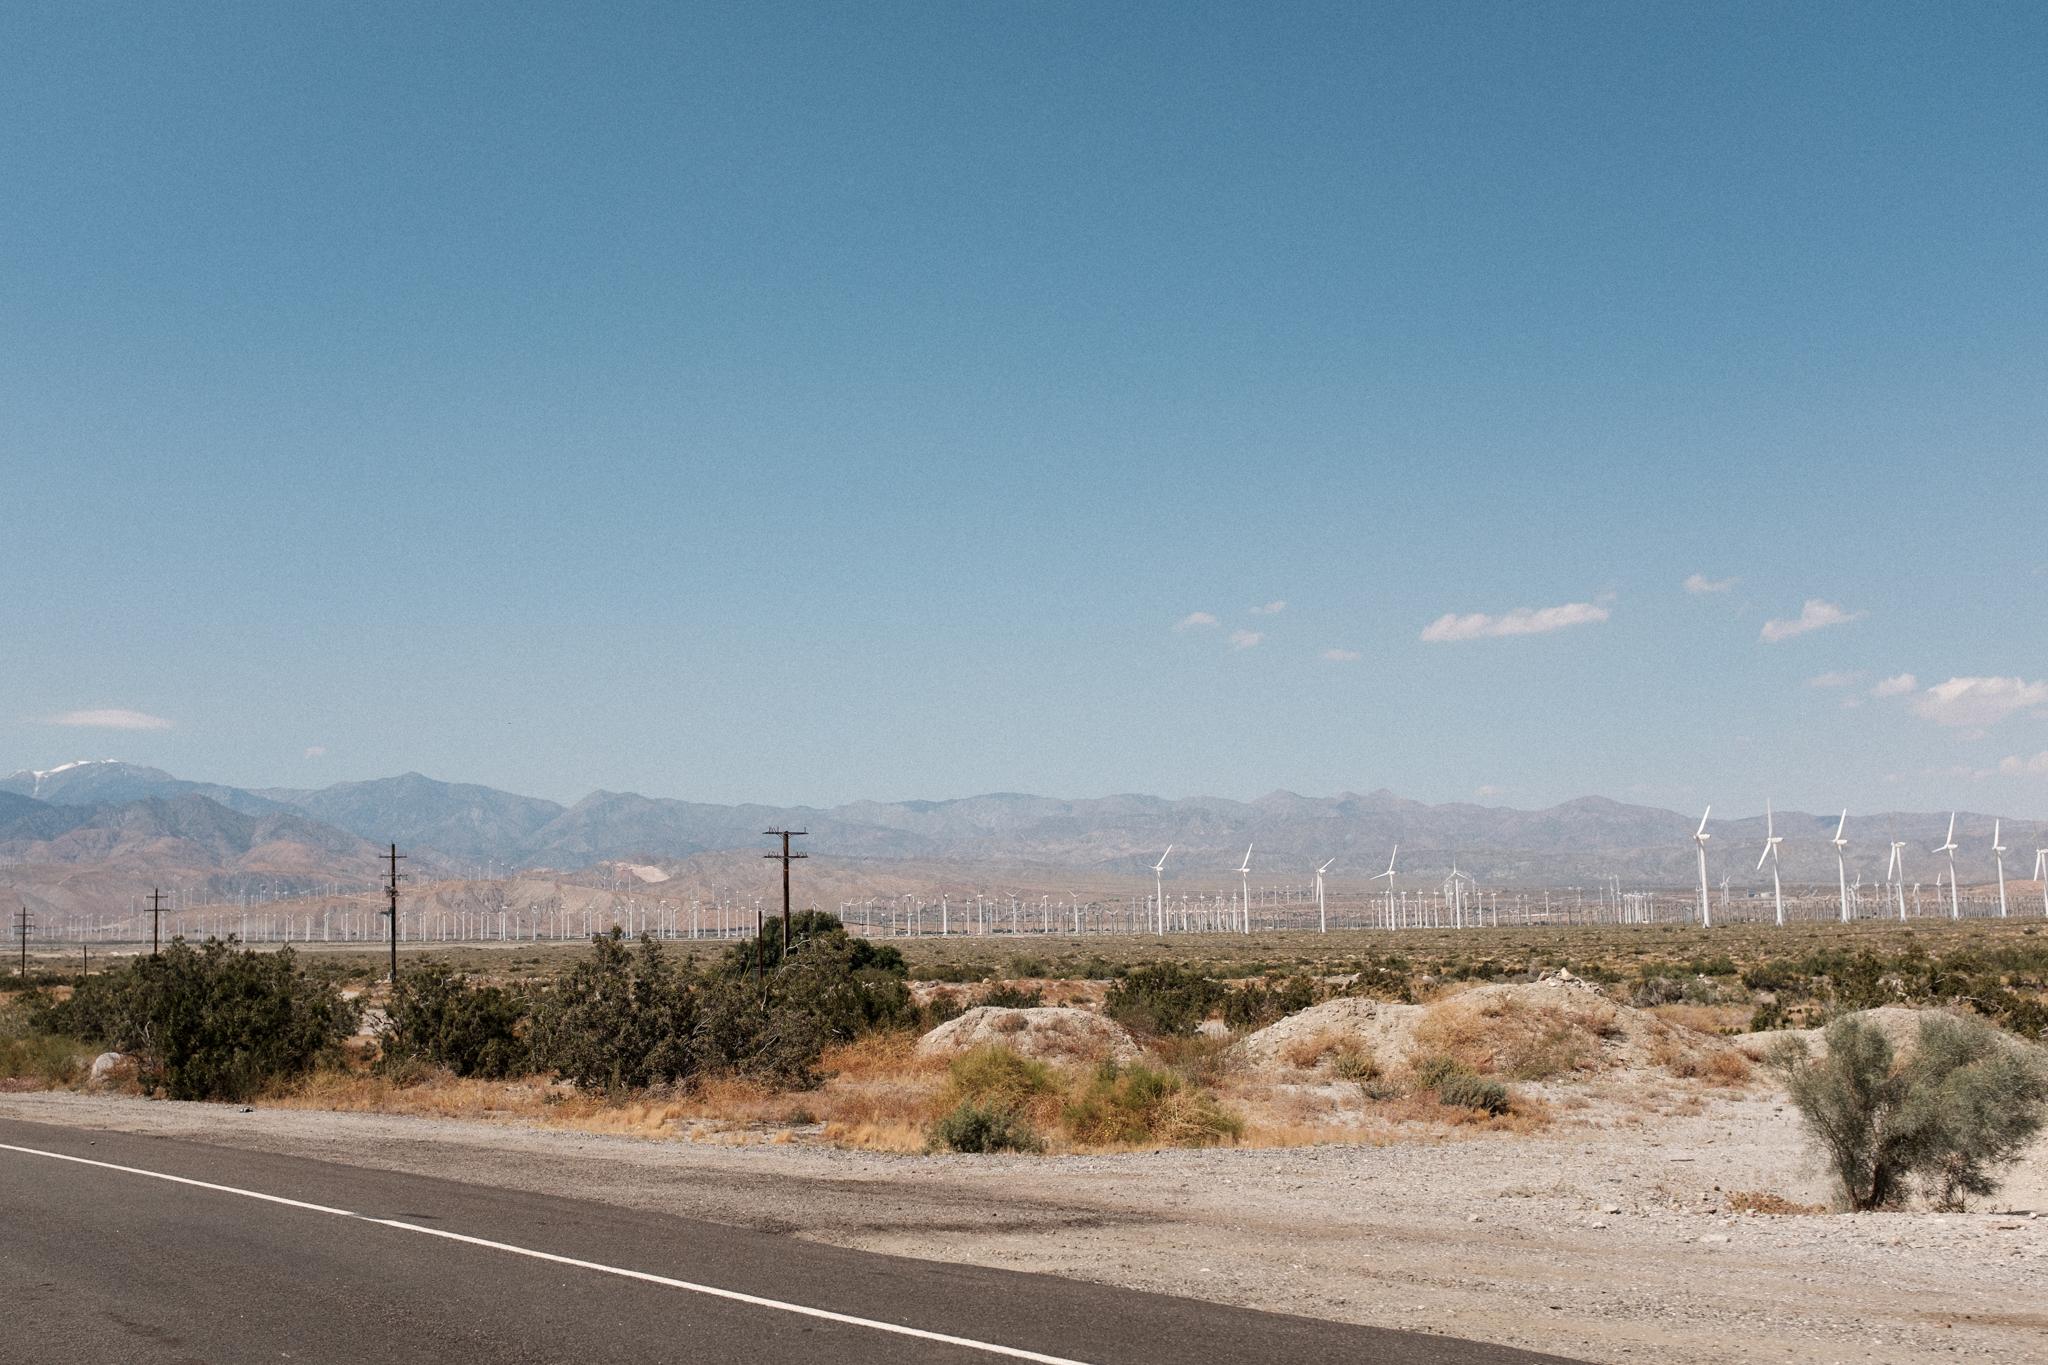 170418 Coachella 17 w1 1513.jpg